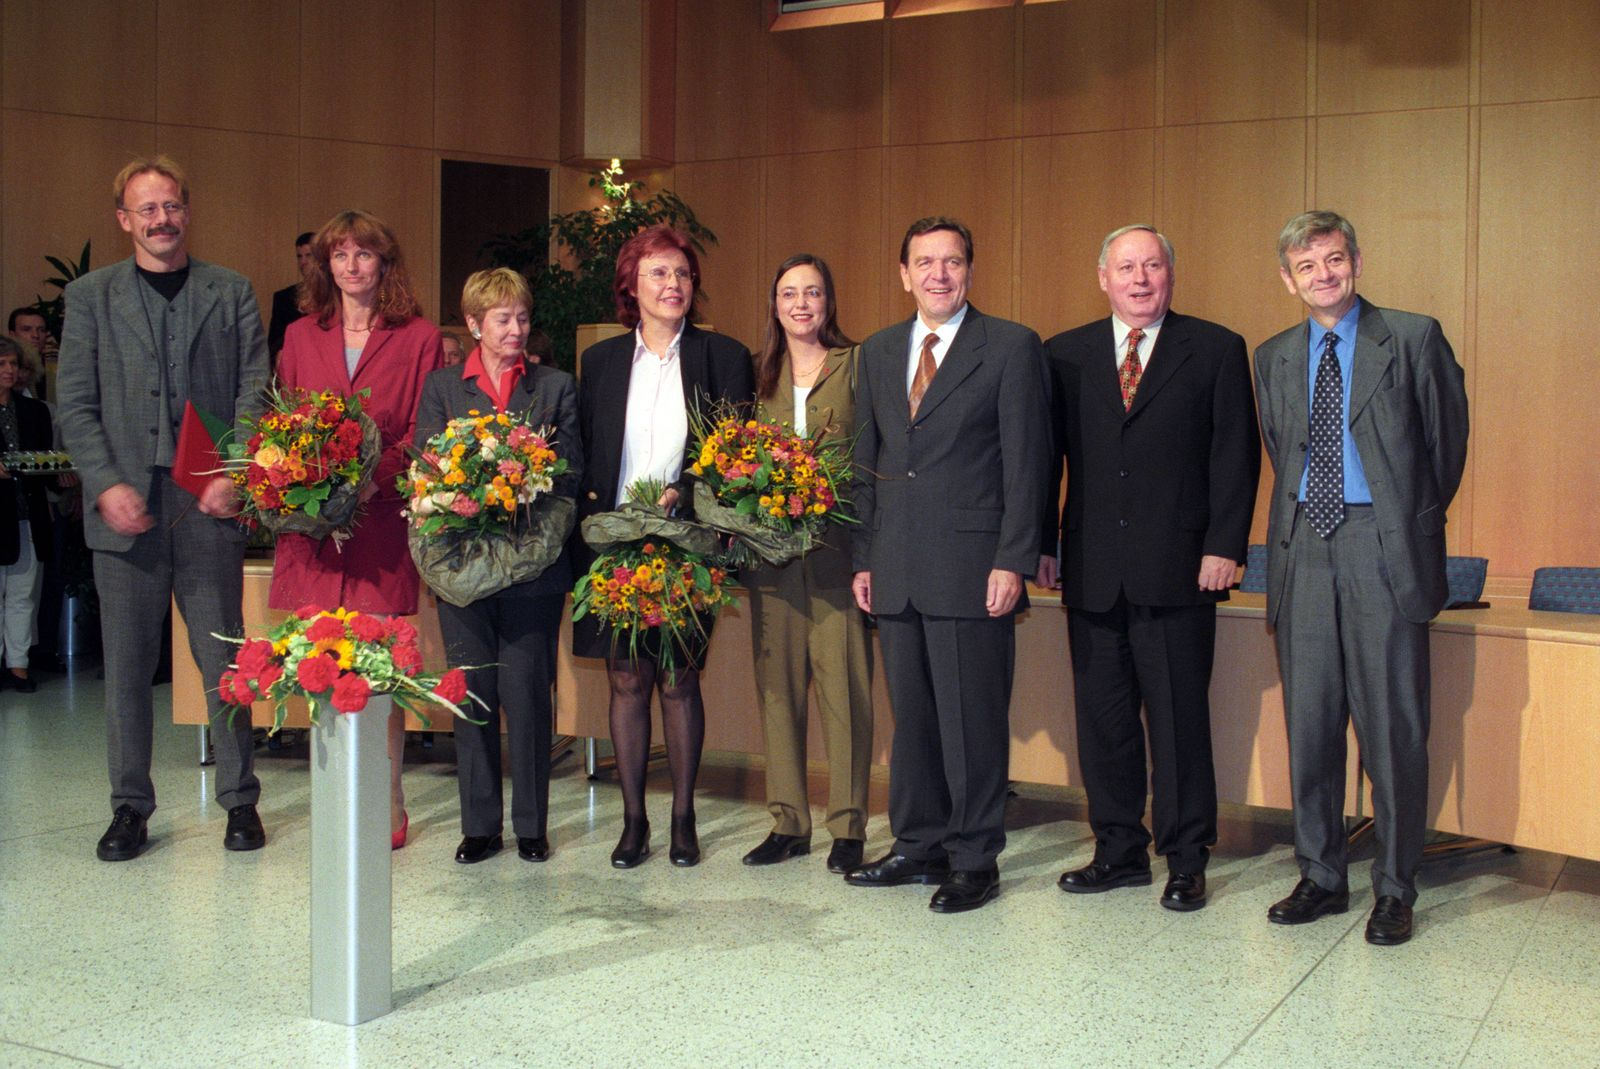 V l n r Jürgen Trittin Gunda Röstel Heidemarie Wieczorek Zeul Christine Bergmann Kerstin Müll